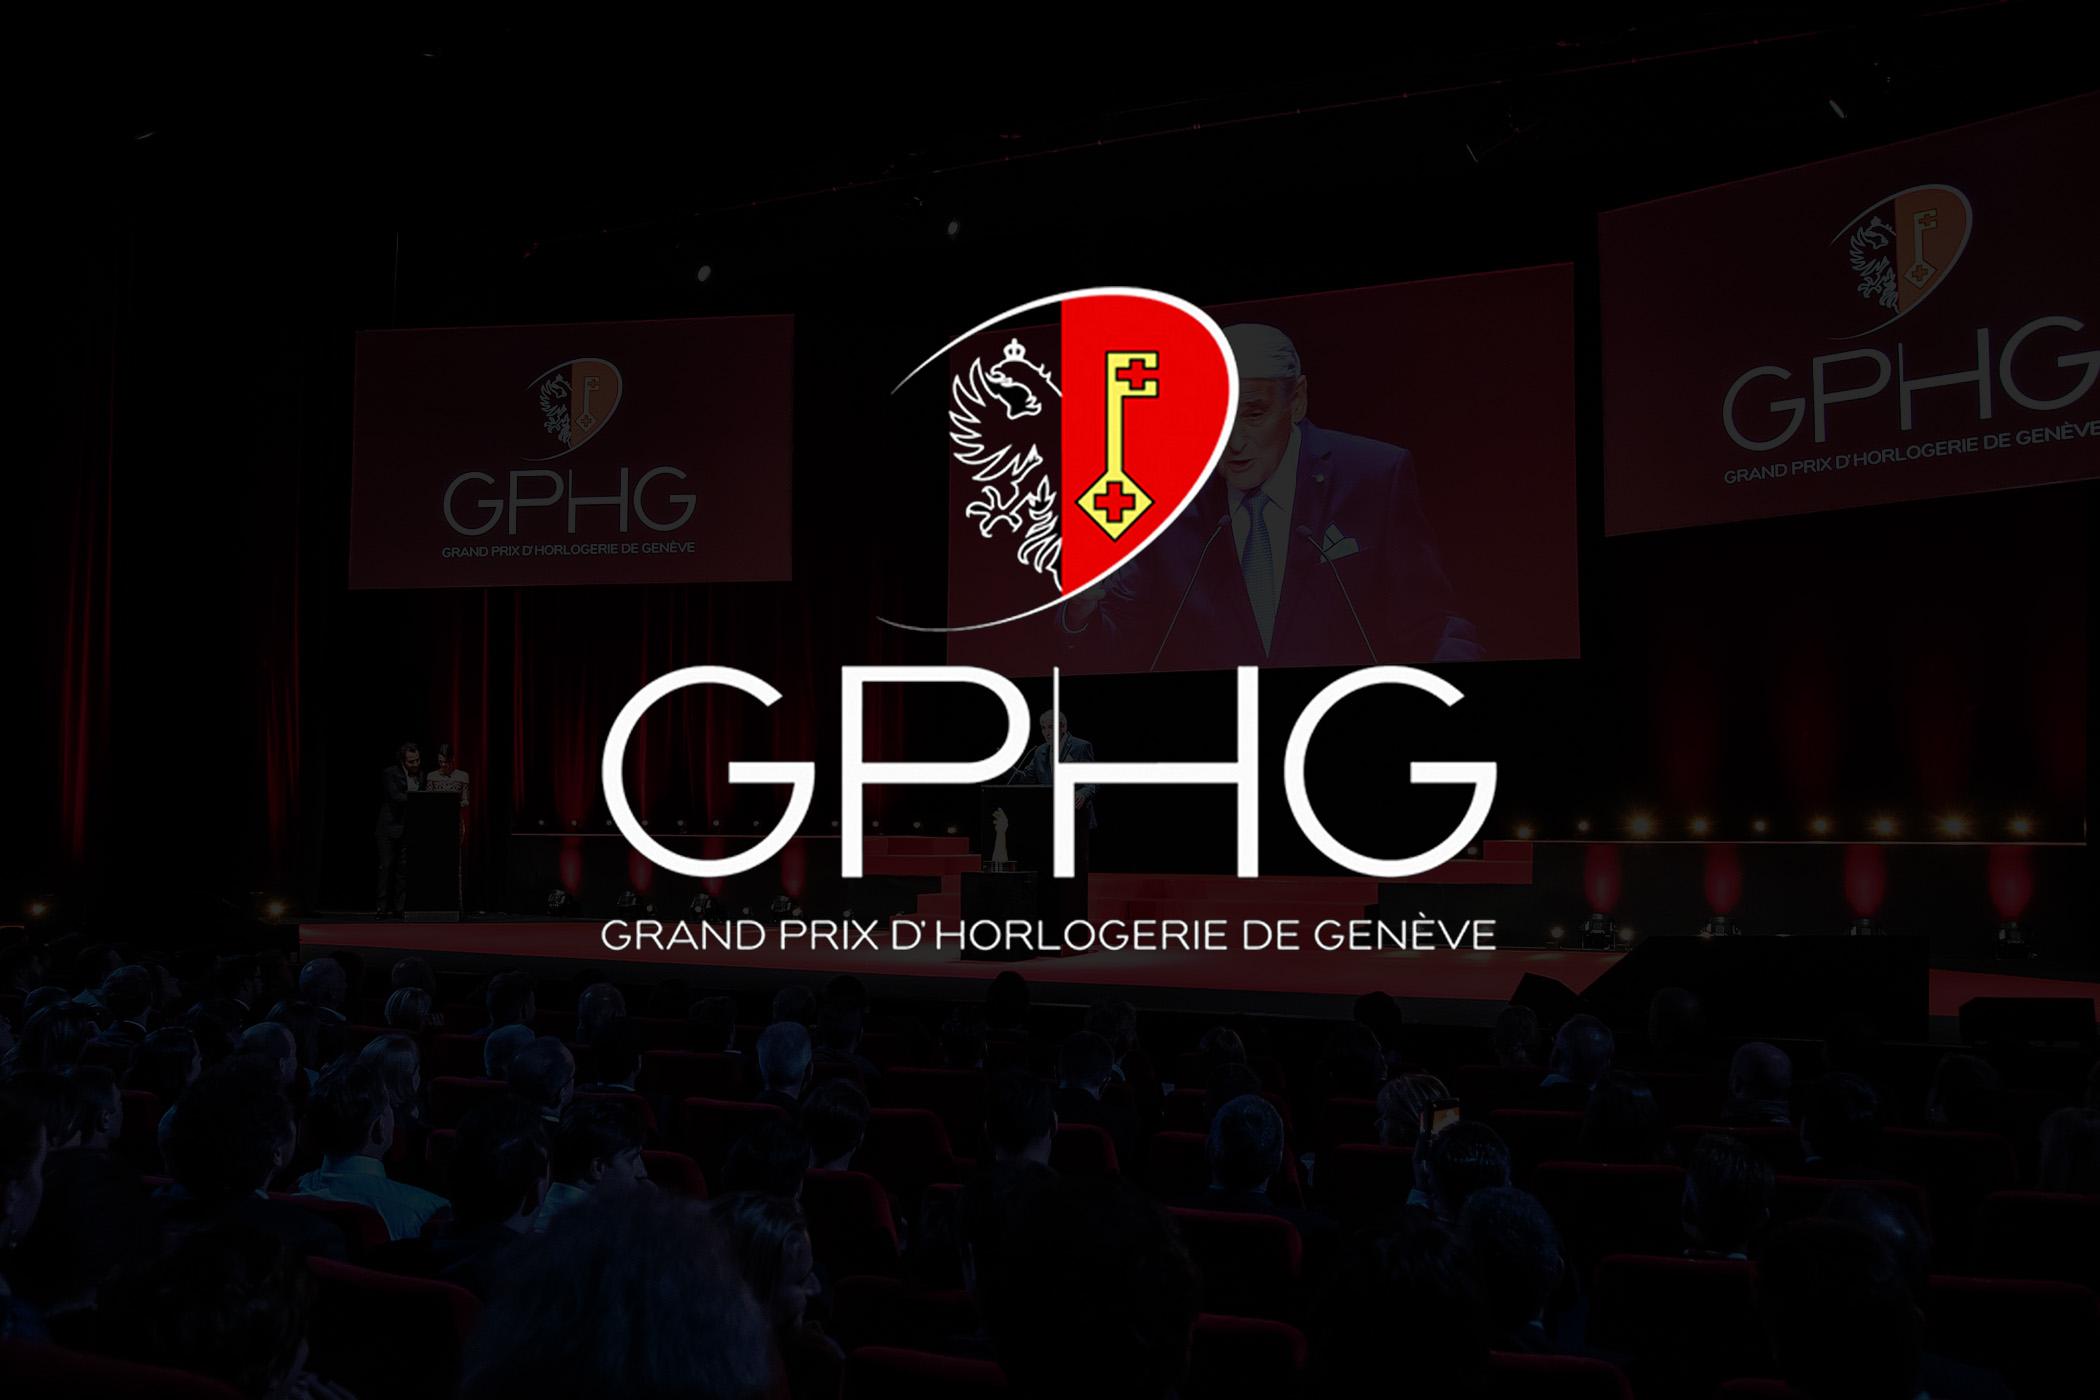 GPHG 2020